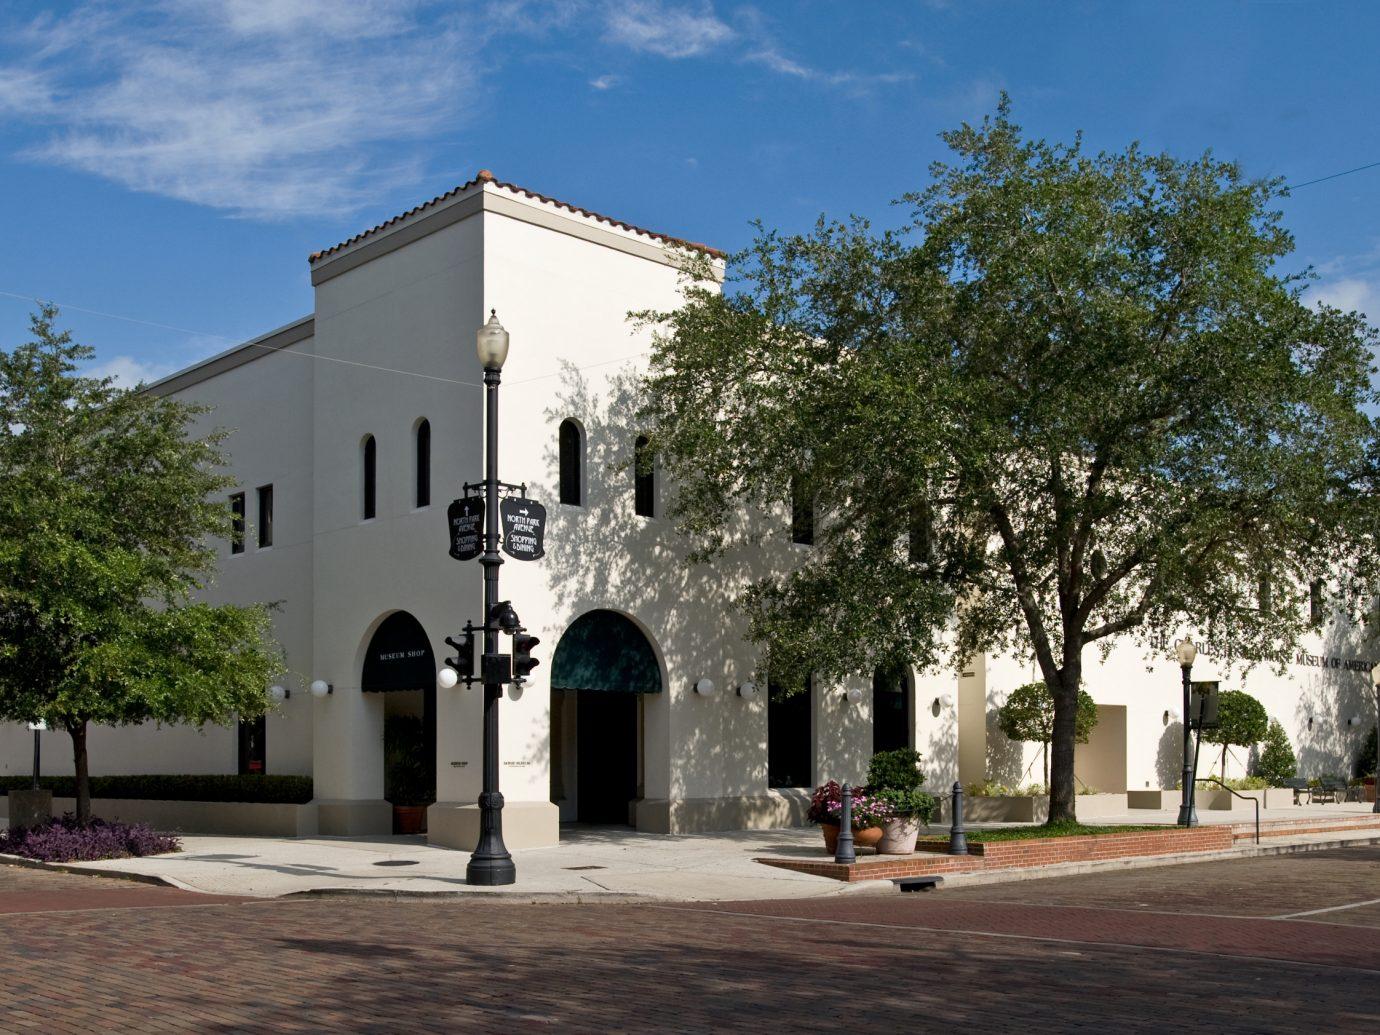 Exterior of the Charles Hosmer Morse Museum of American Art, Orlando, FL